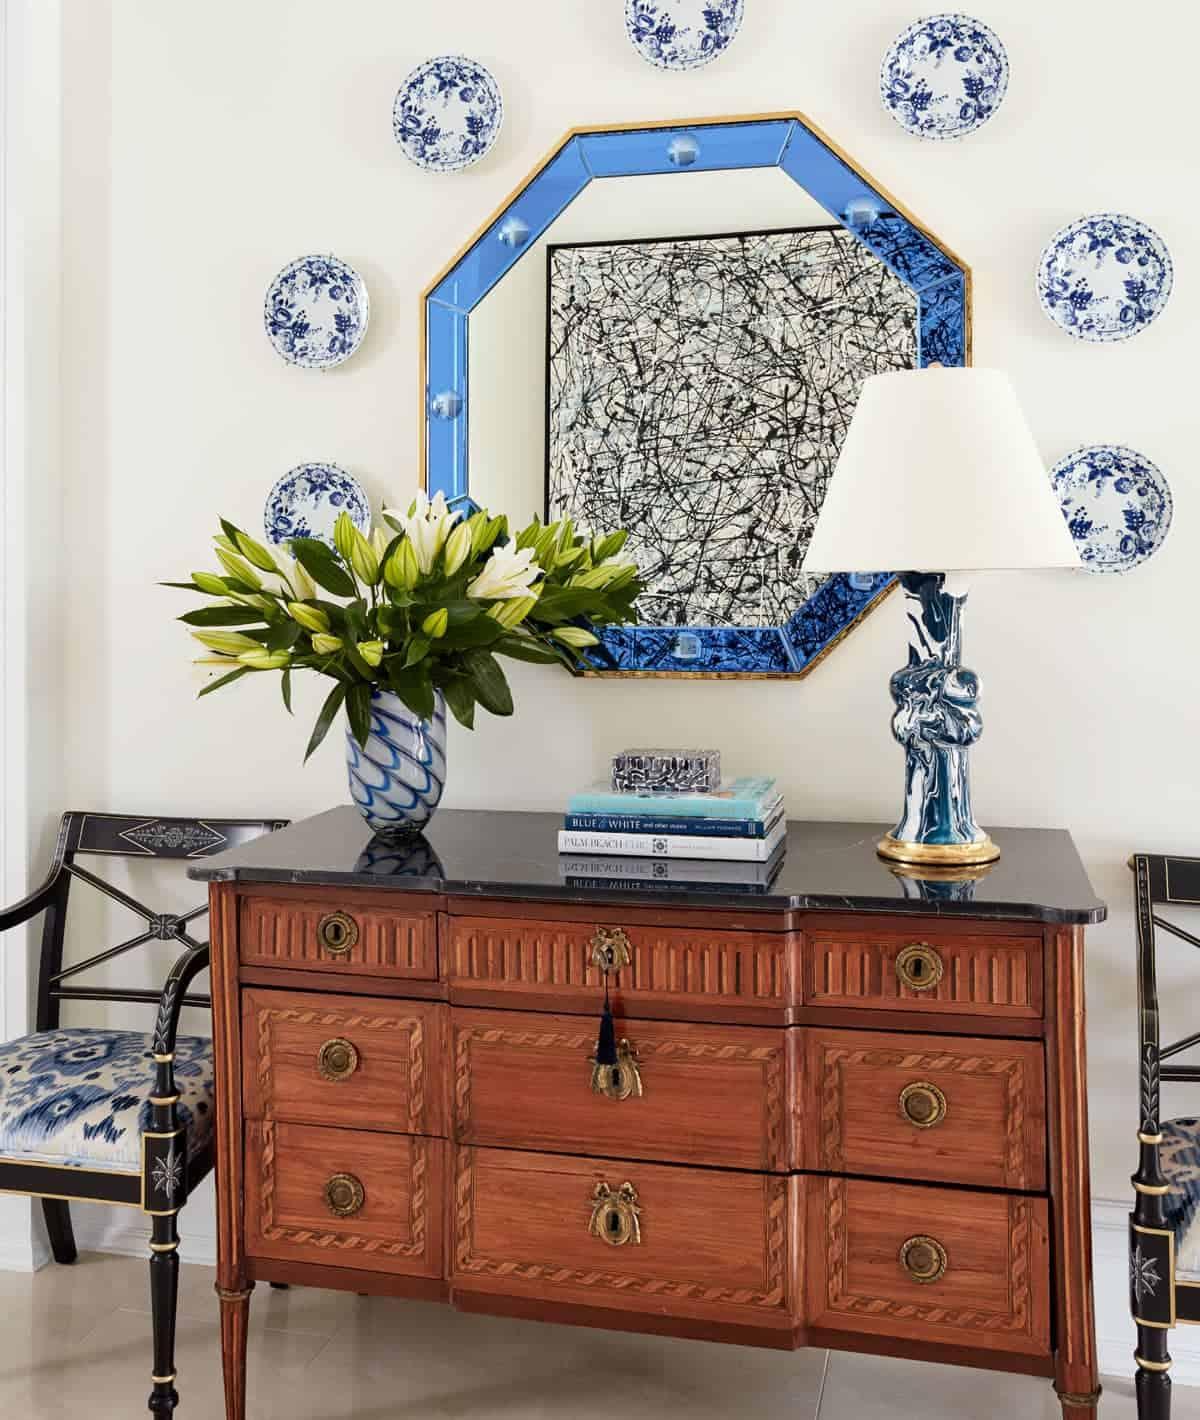 Louis XVI Furniture Styles: Styylish Spotlight – Styylish